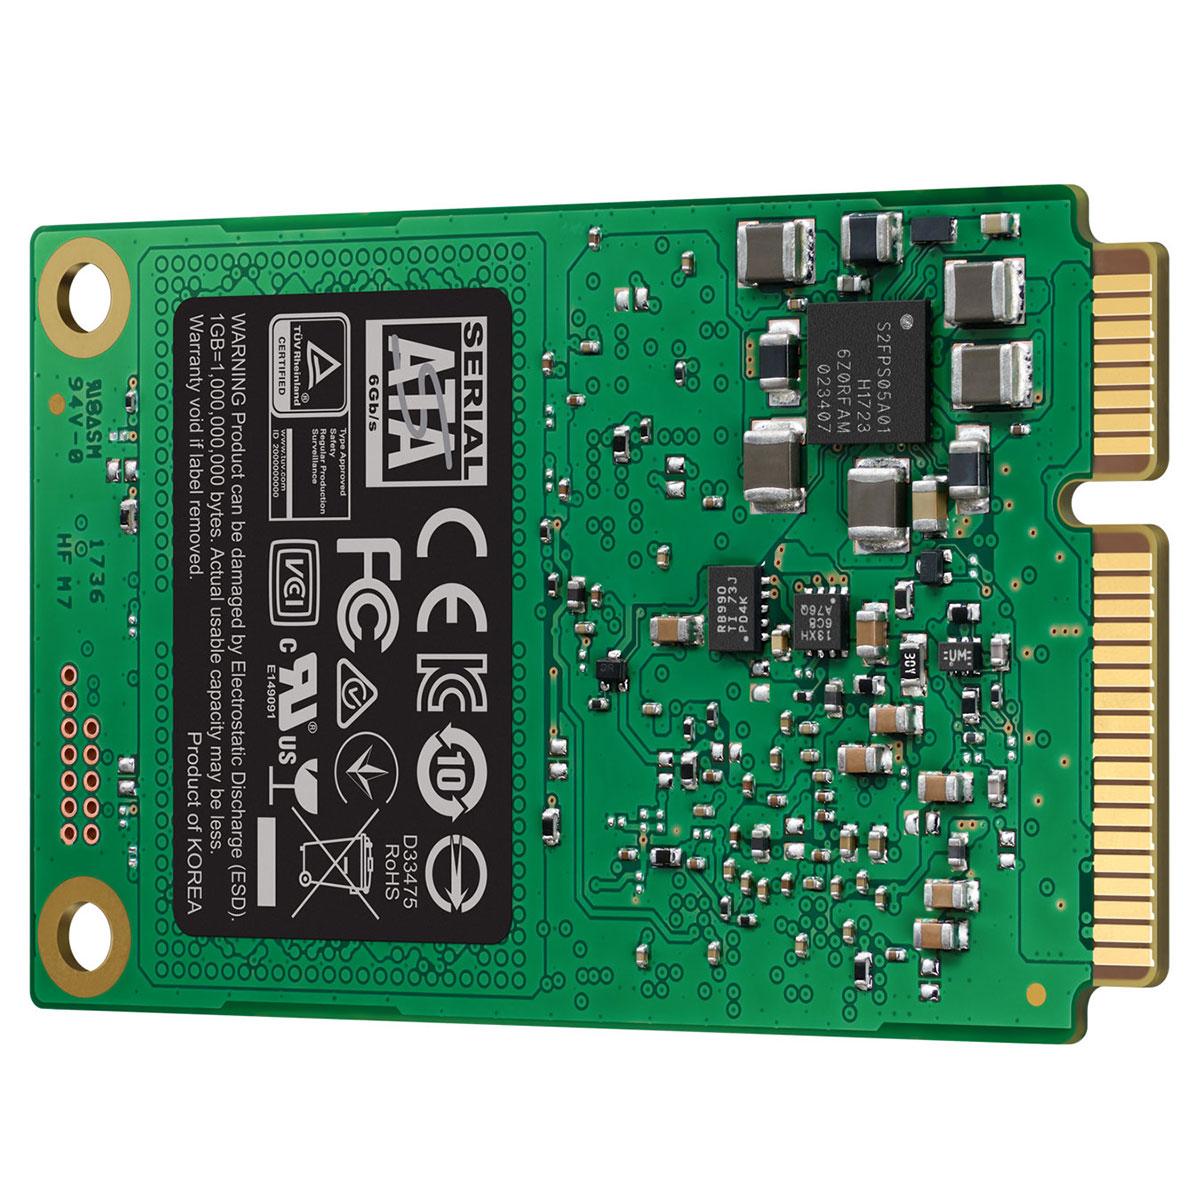 Samsung 860 EVO 480-525Go - Disque SSD Samsung - Cybertek.fr - 2